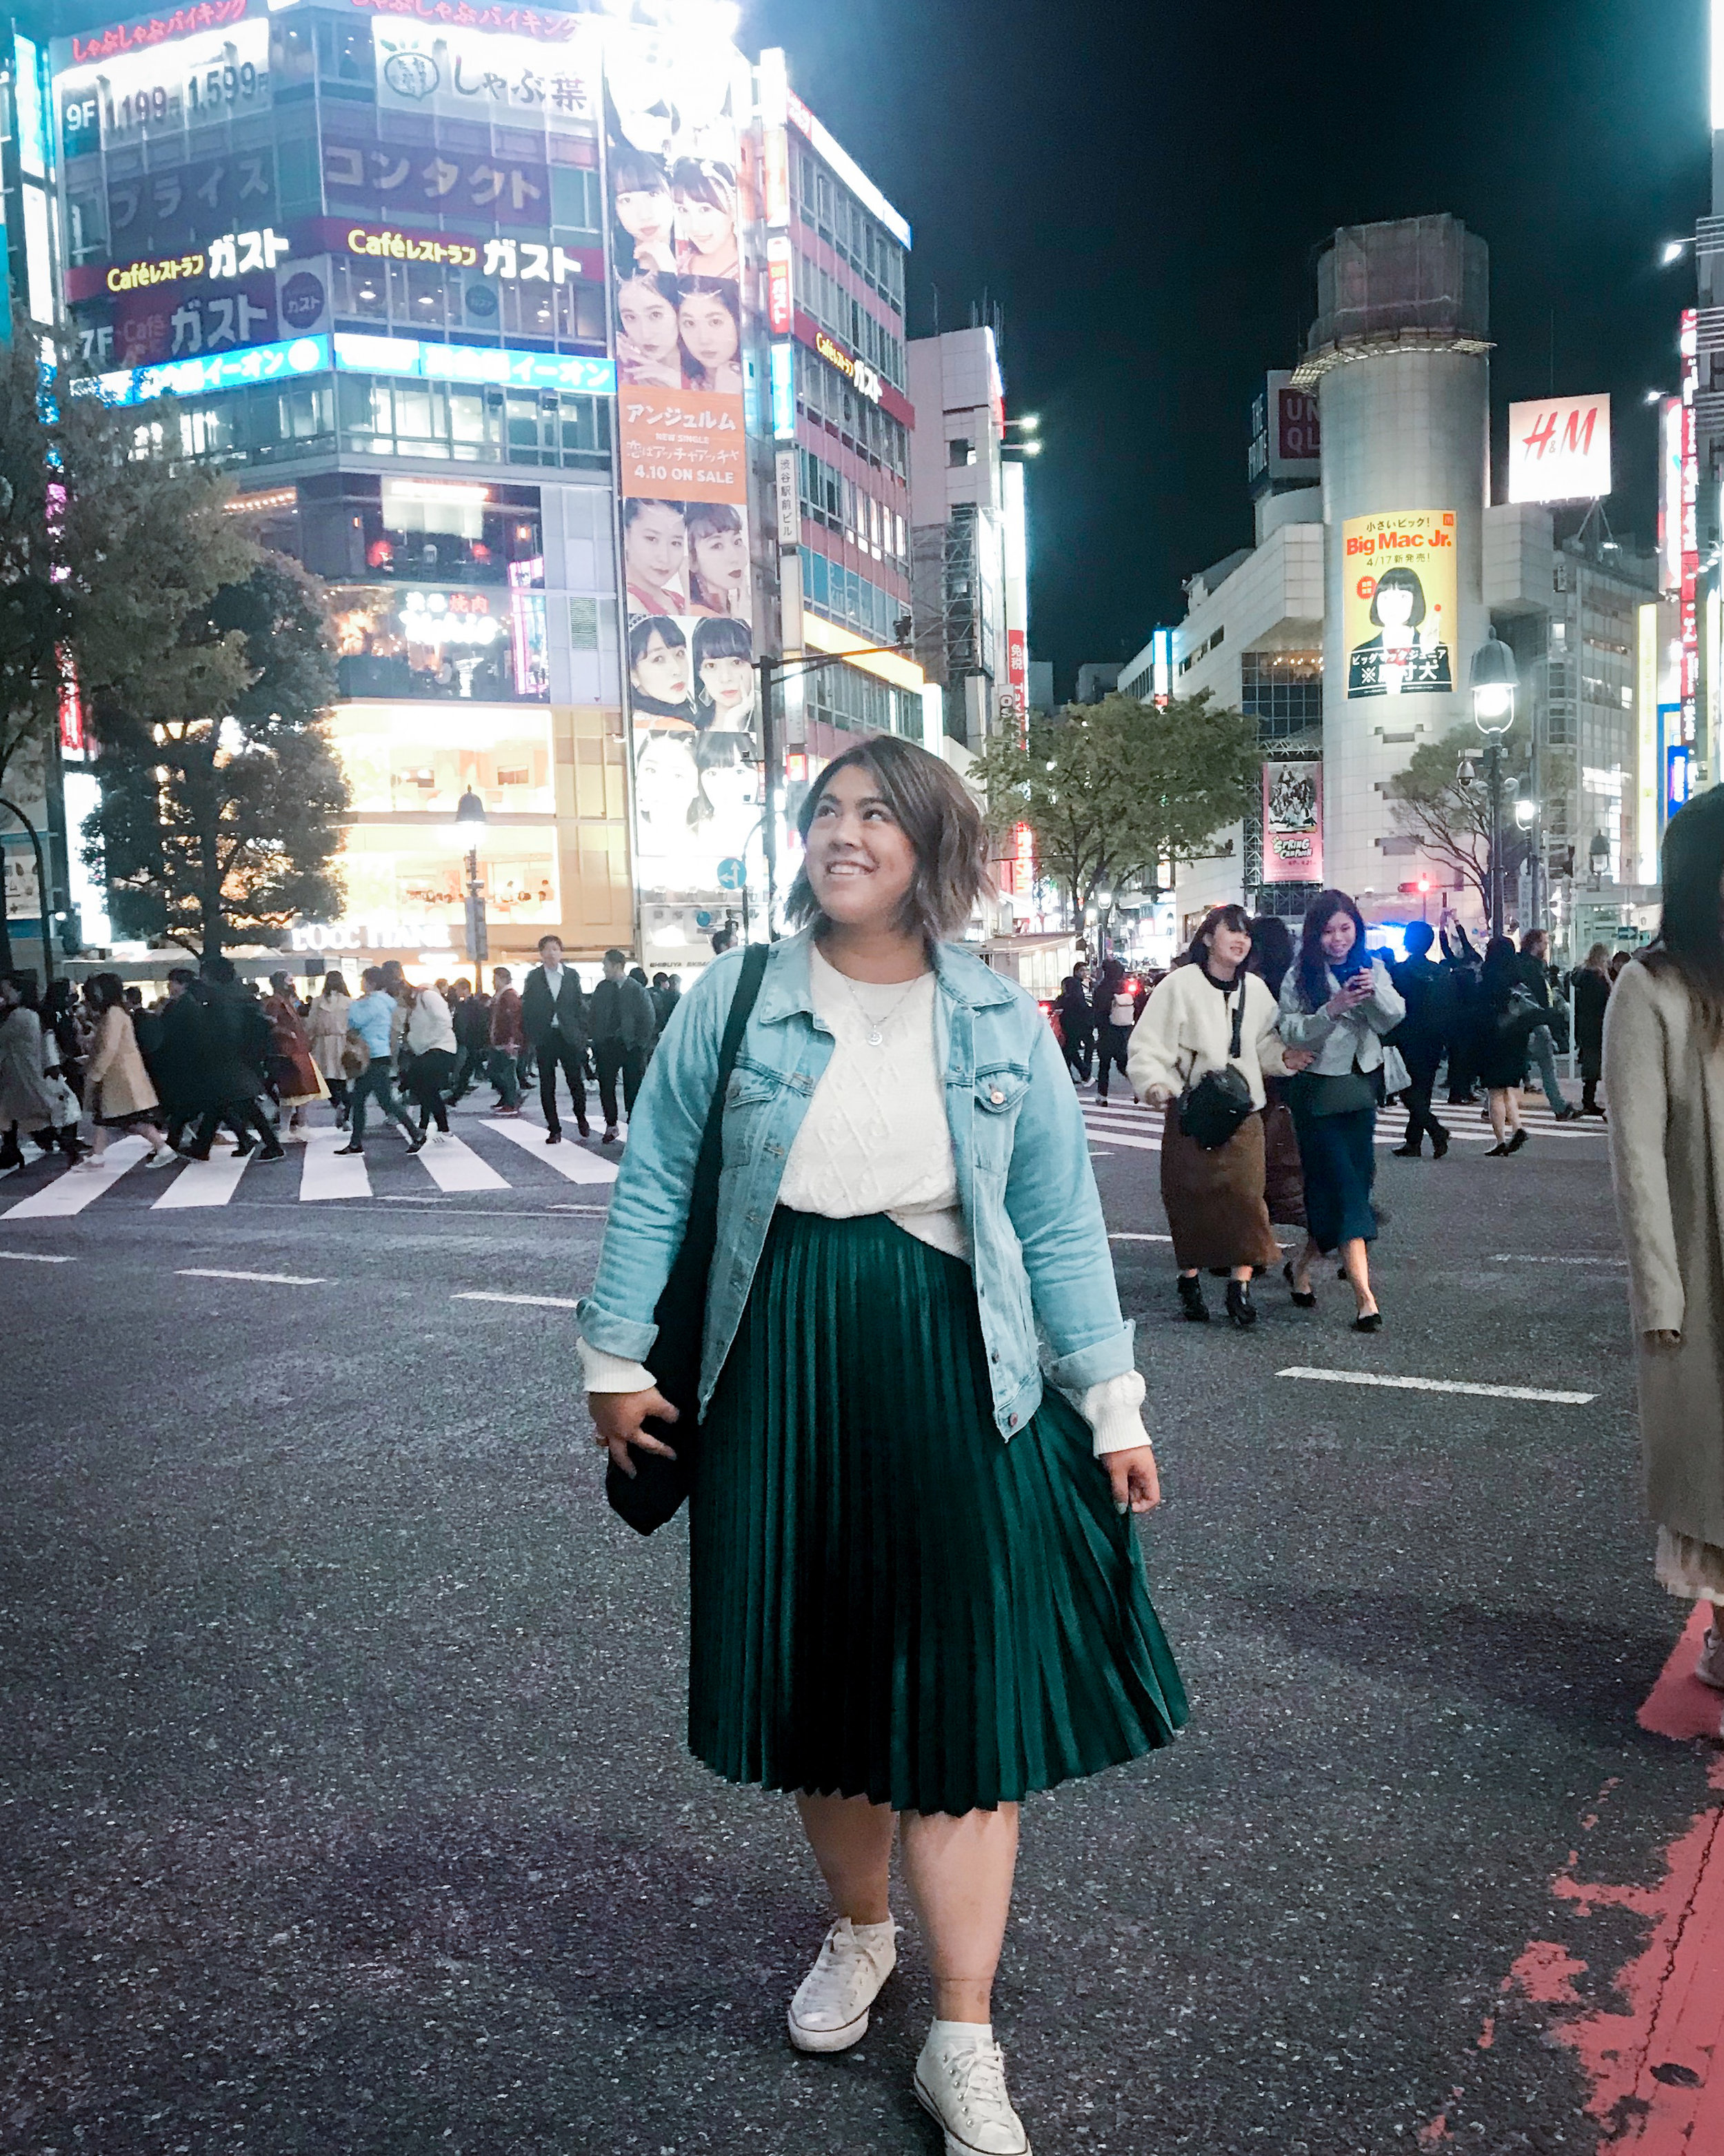 Night out in Shibuya - at Shibuya Crossing